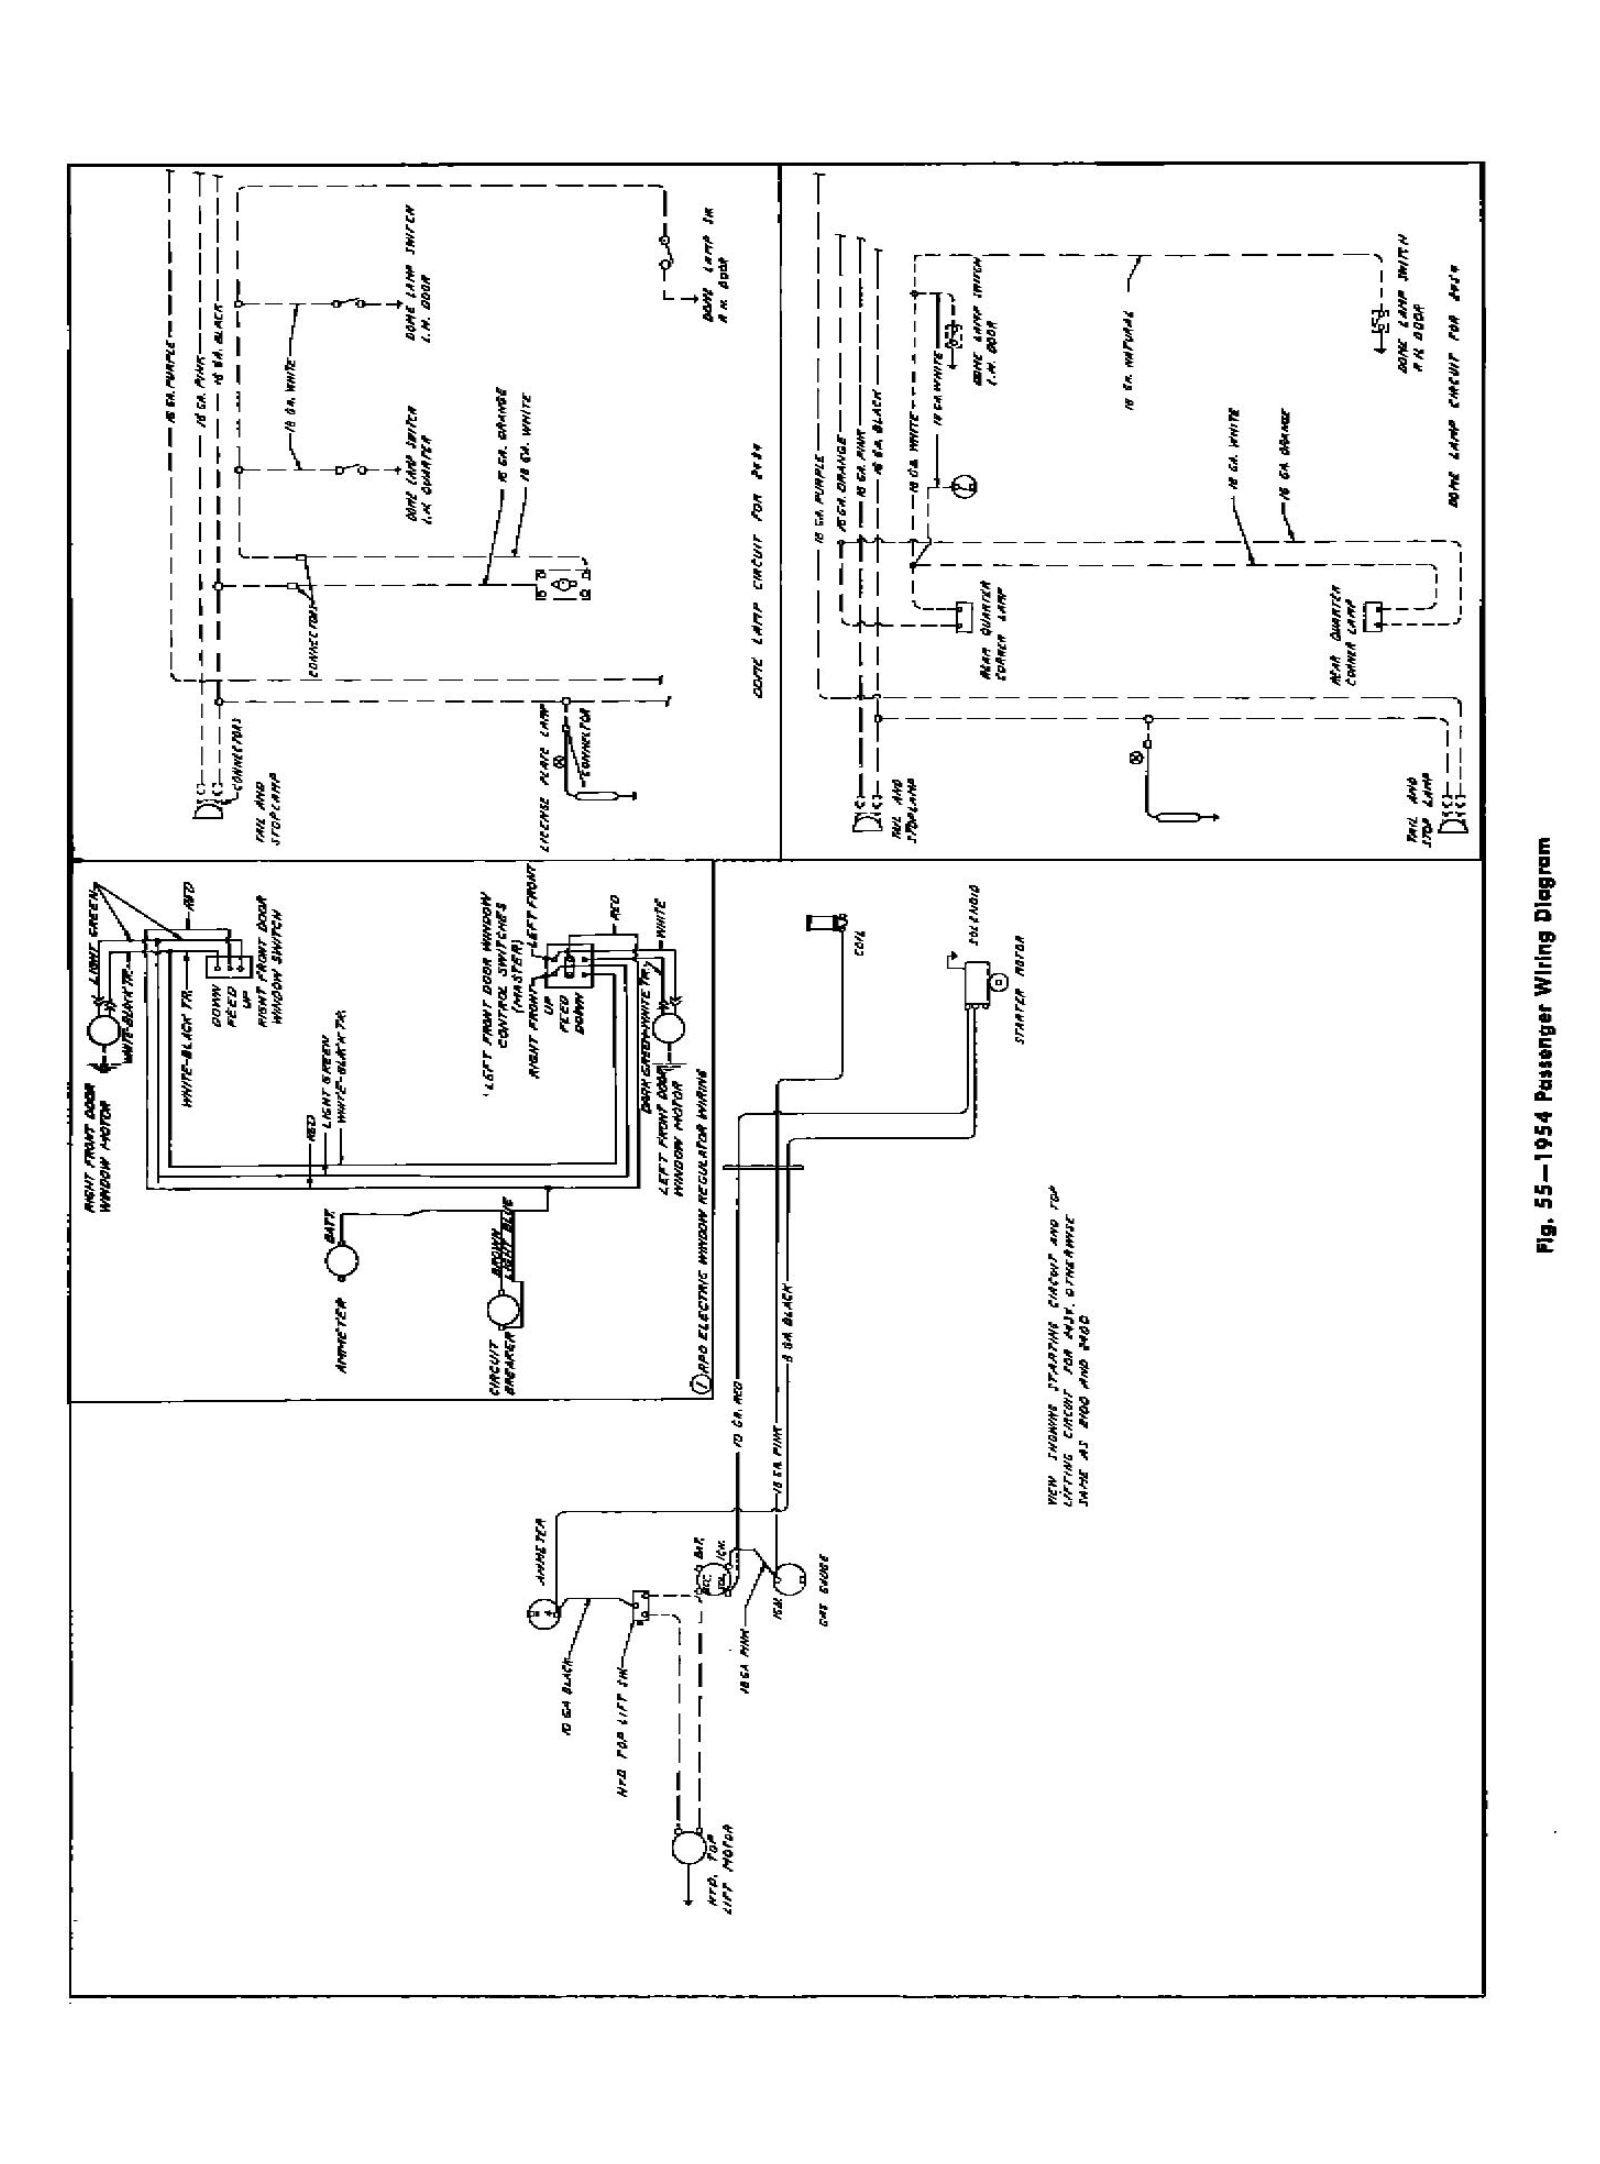 Captivating Ih Tractor Wiring Diagram Gallery Block diagram – Ih 284 Wiring Harness